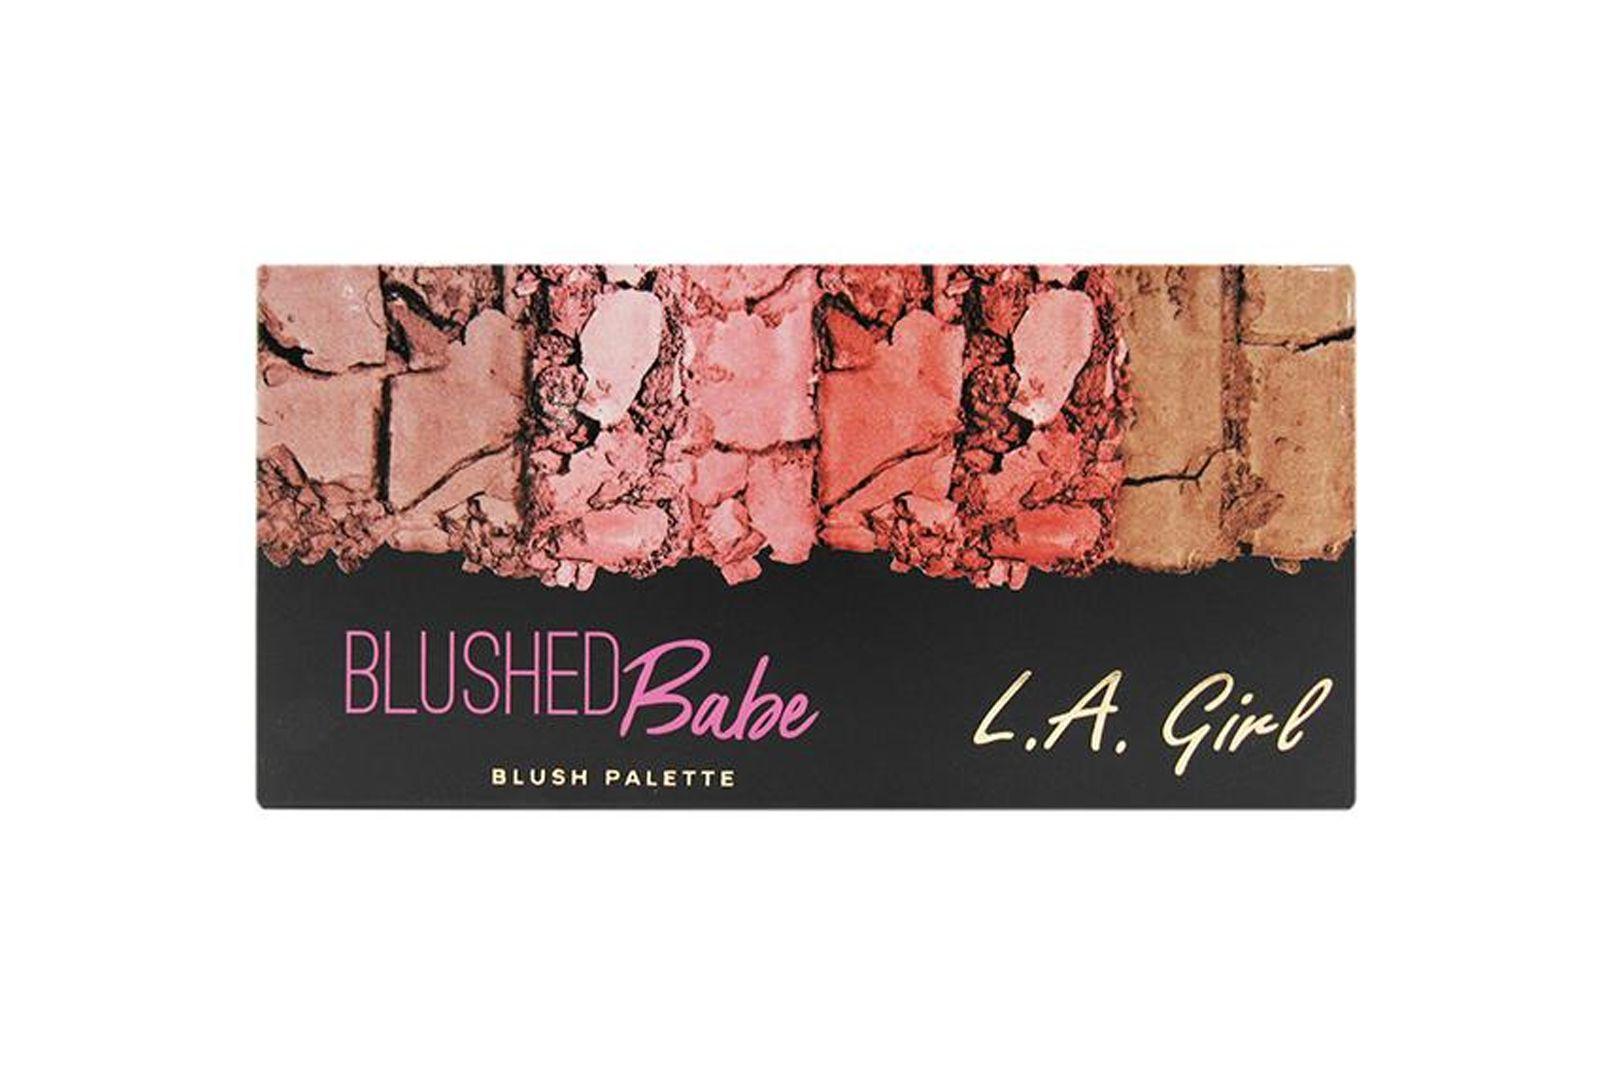 .A. Girl Fanatic Blush Palette - Blushed Babe (GBL422)